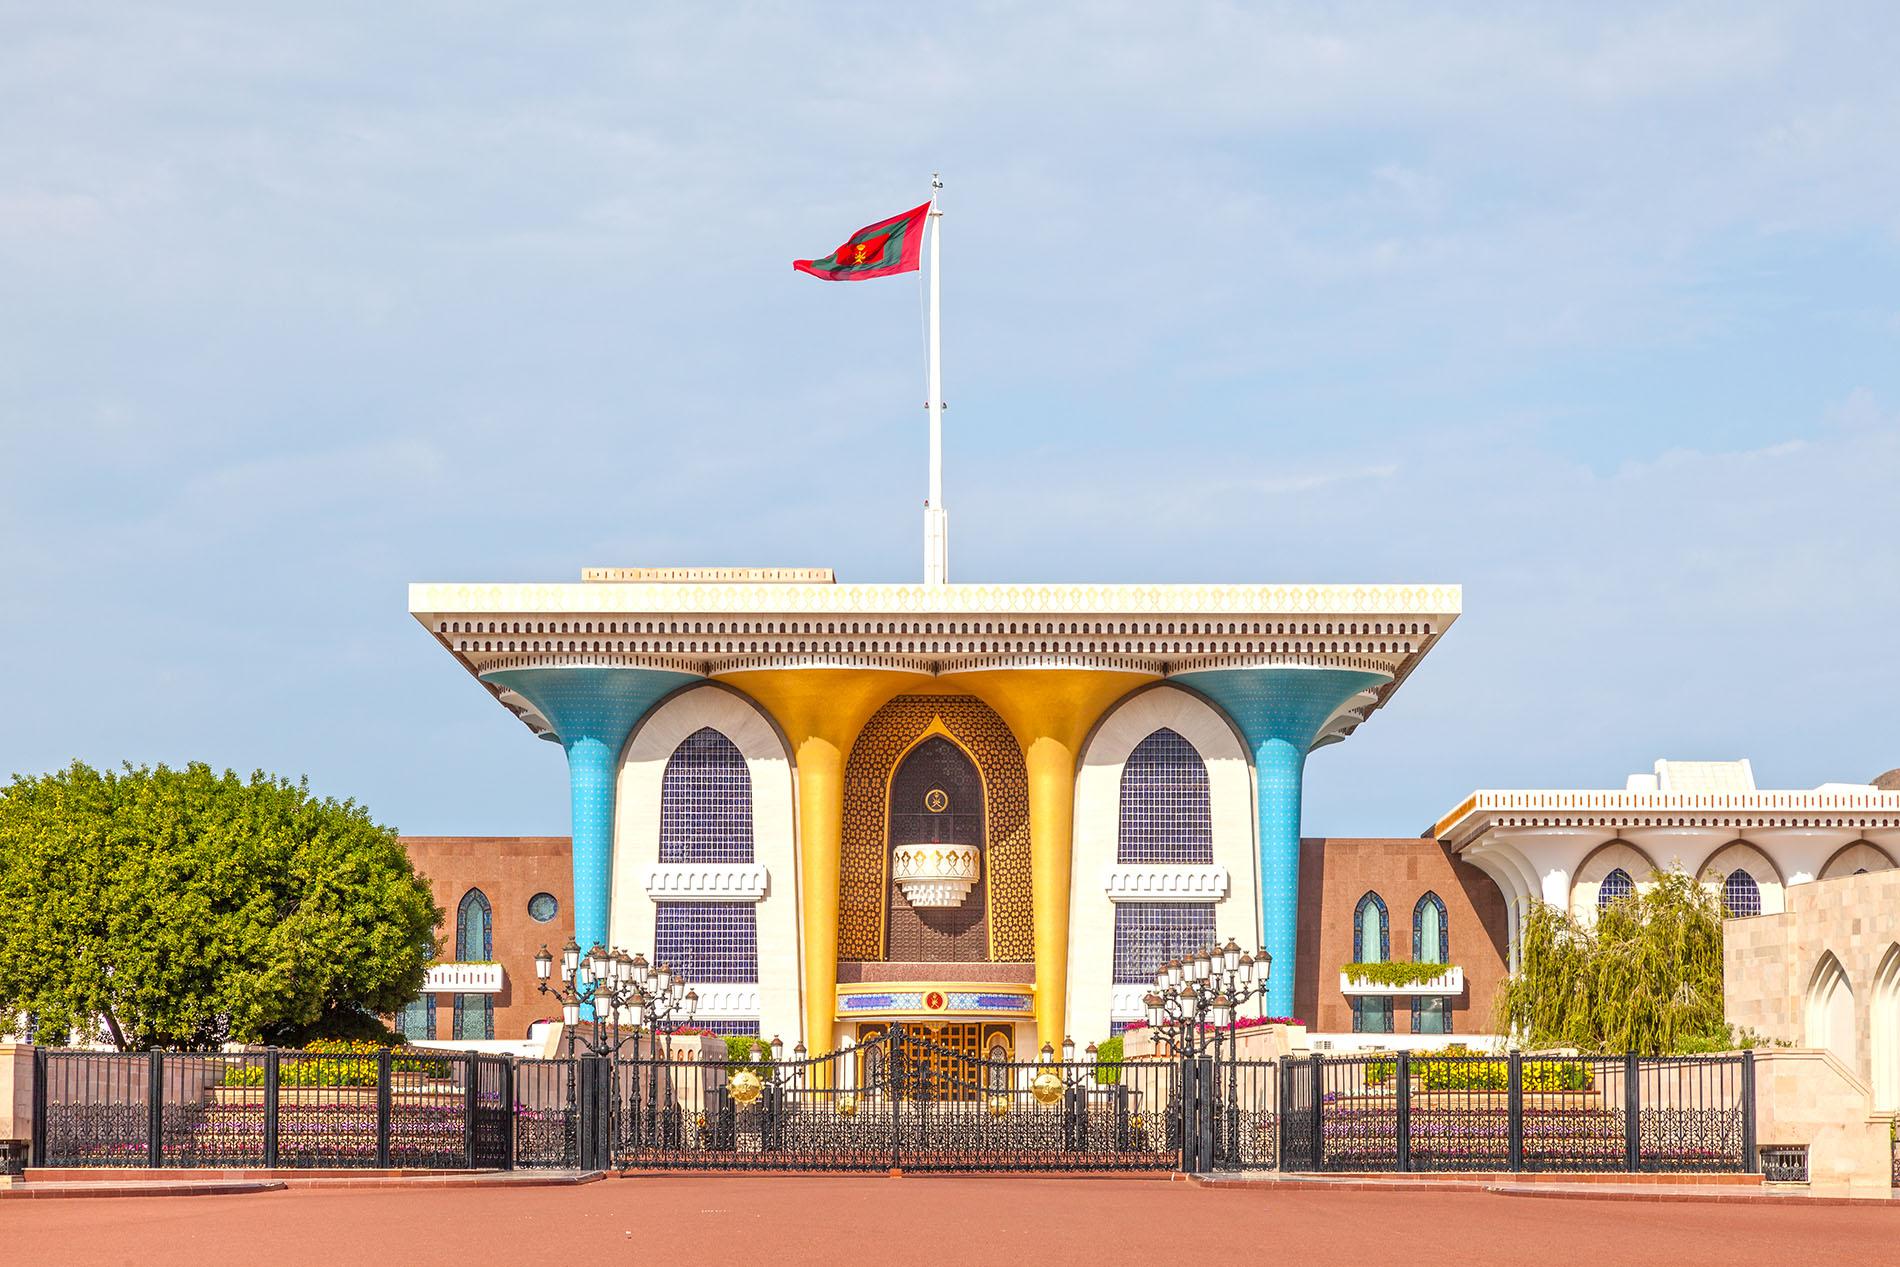 Muscat, Oman - Nov 24, 2015: Al Alam - the ceremonial palace of Sultan Qaboos of Oman in Muscat